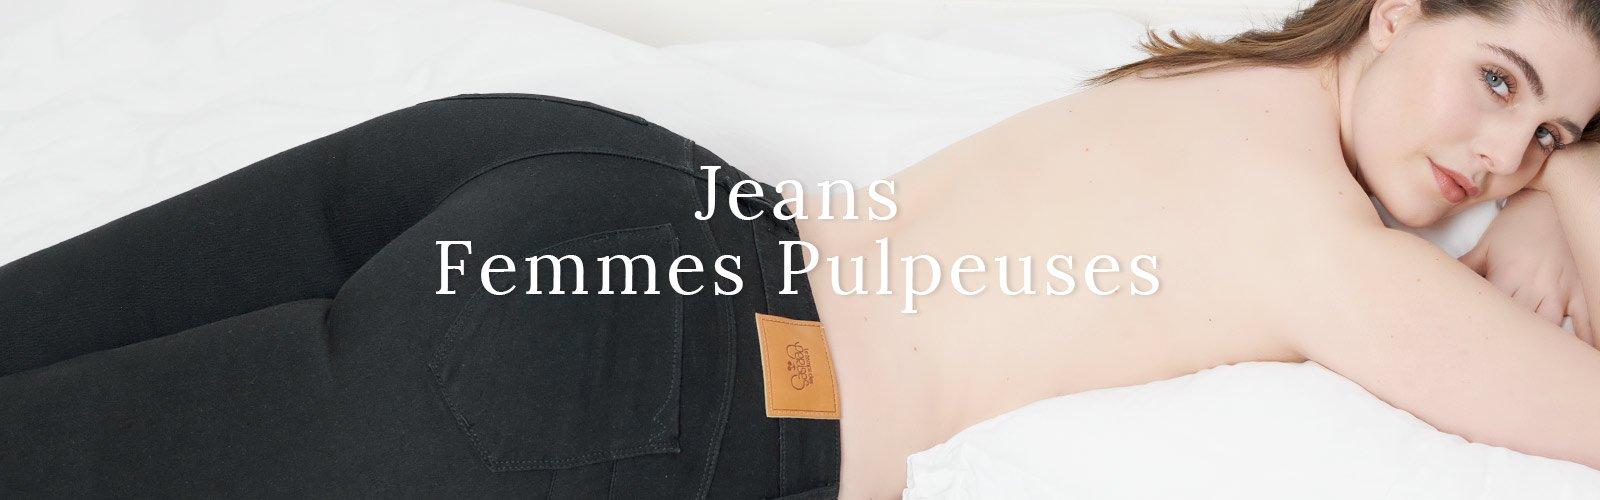 Jeans Femmes Pulpeuses